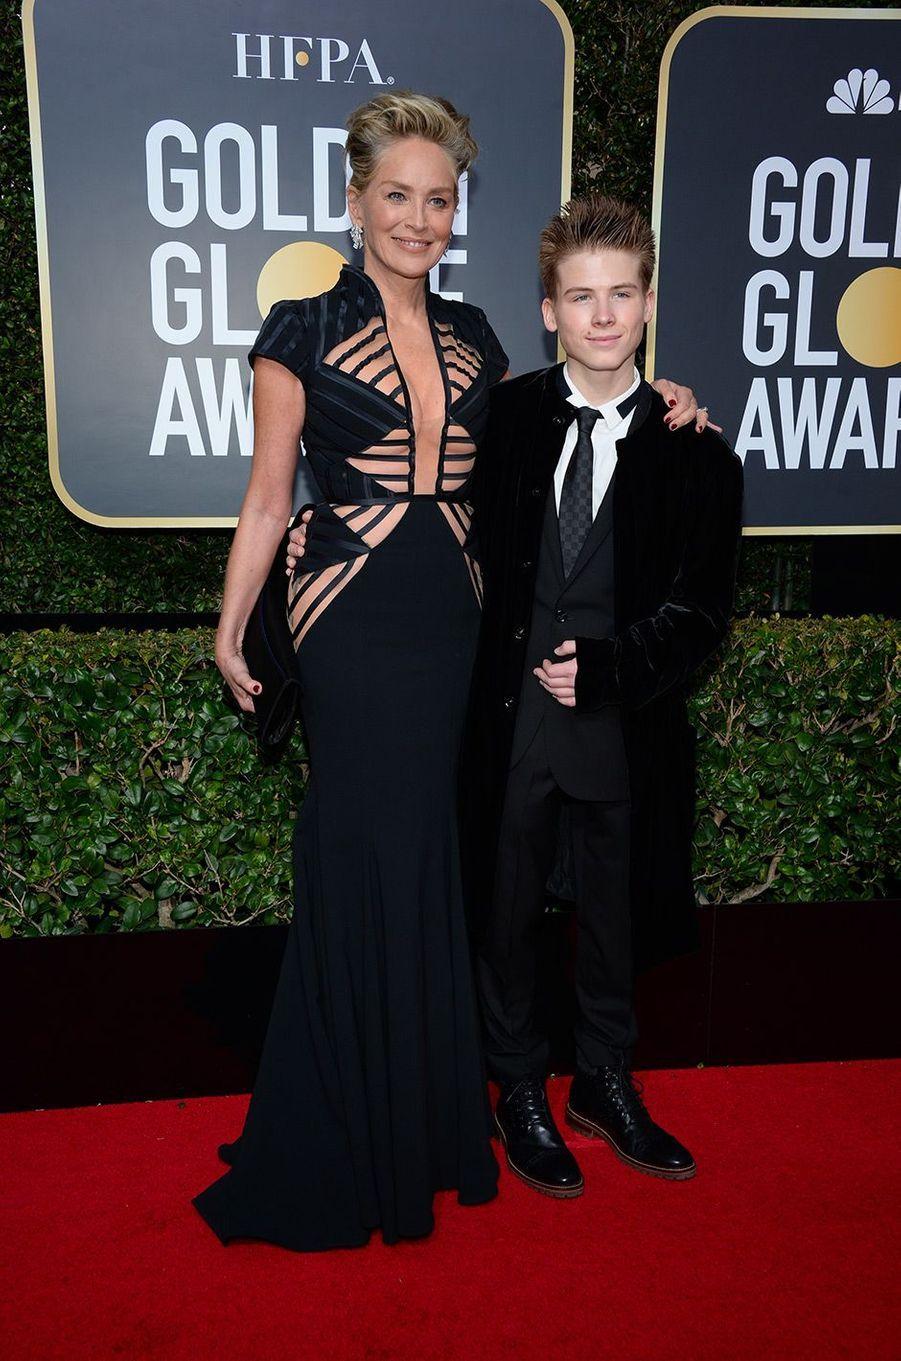 Sharon Stone dans une robe Vitor Zerbinato aux Golden Globes 2018, avec son fils